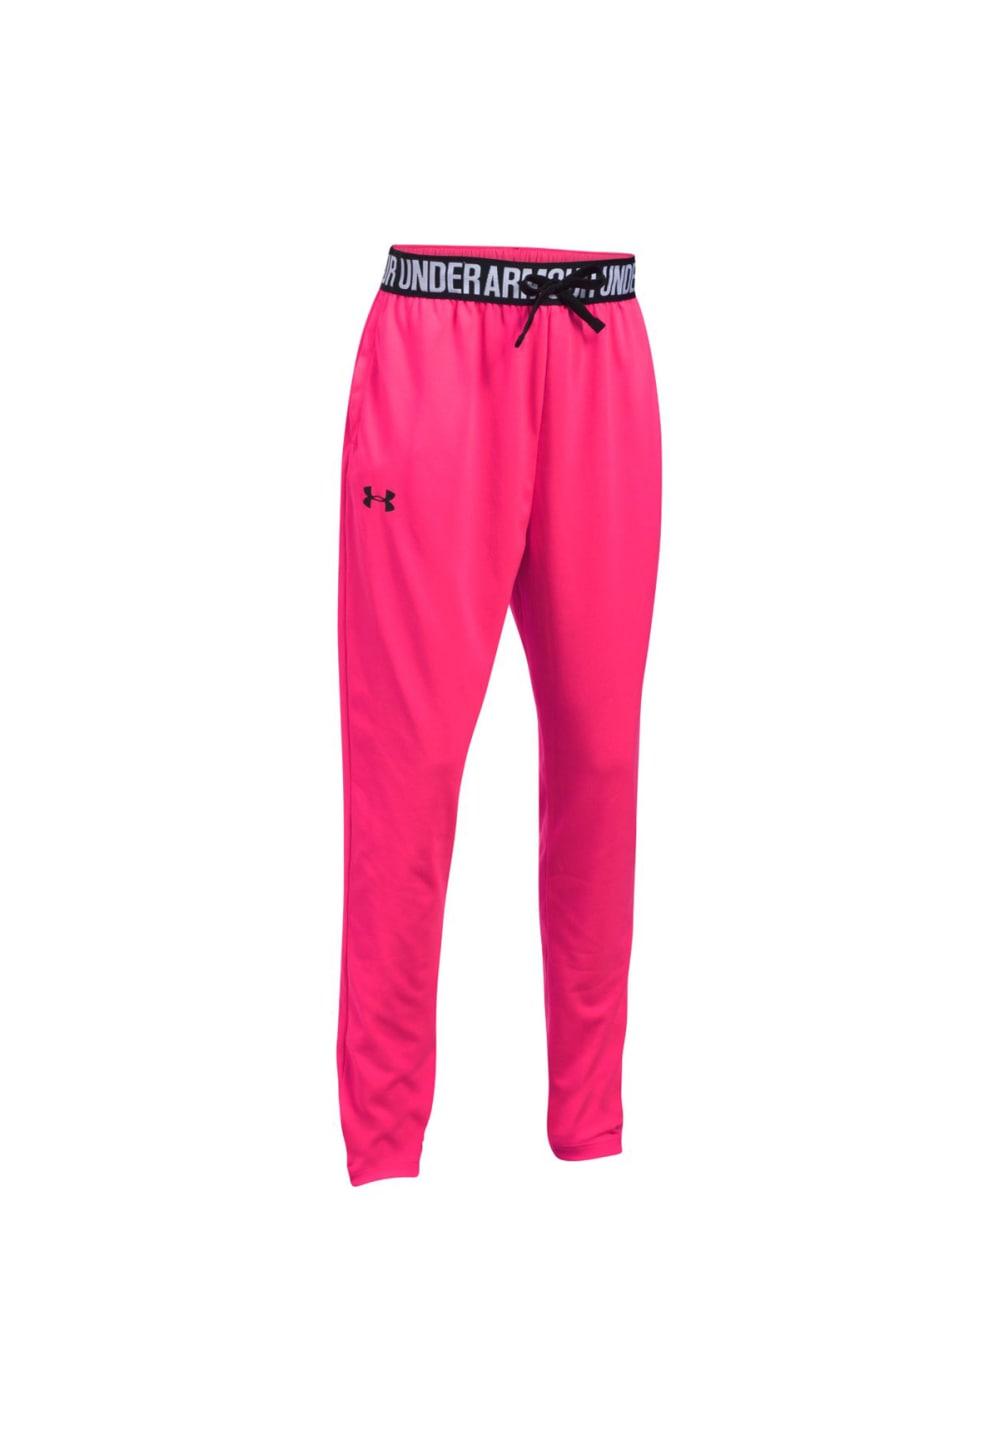 Under Armour Tech Jogger - Fitnesshosen für Kinder Unisex - Pink, Gr. L